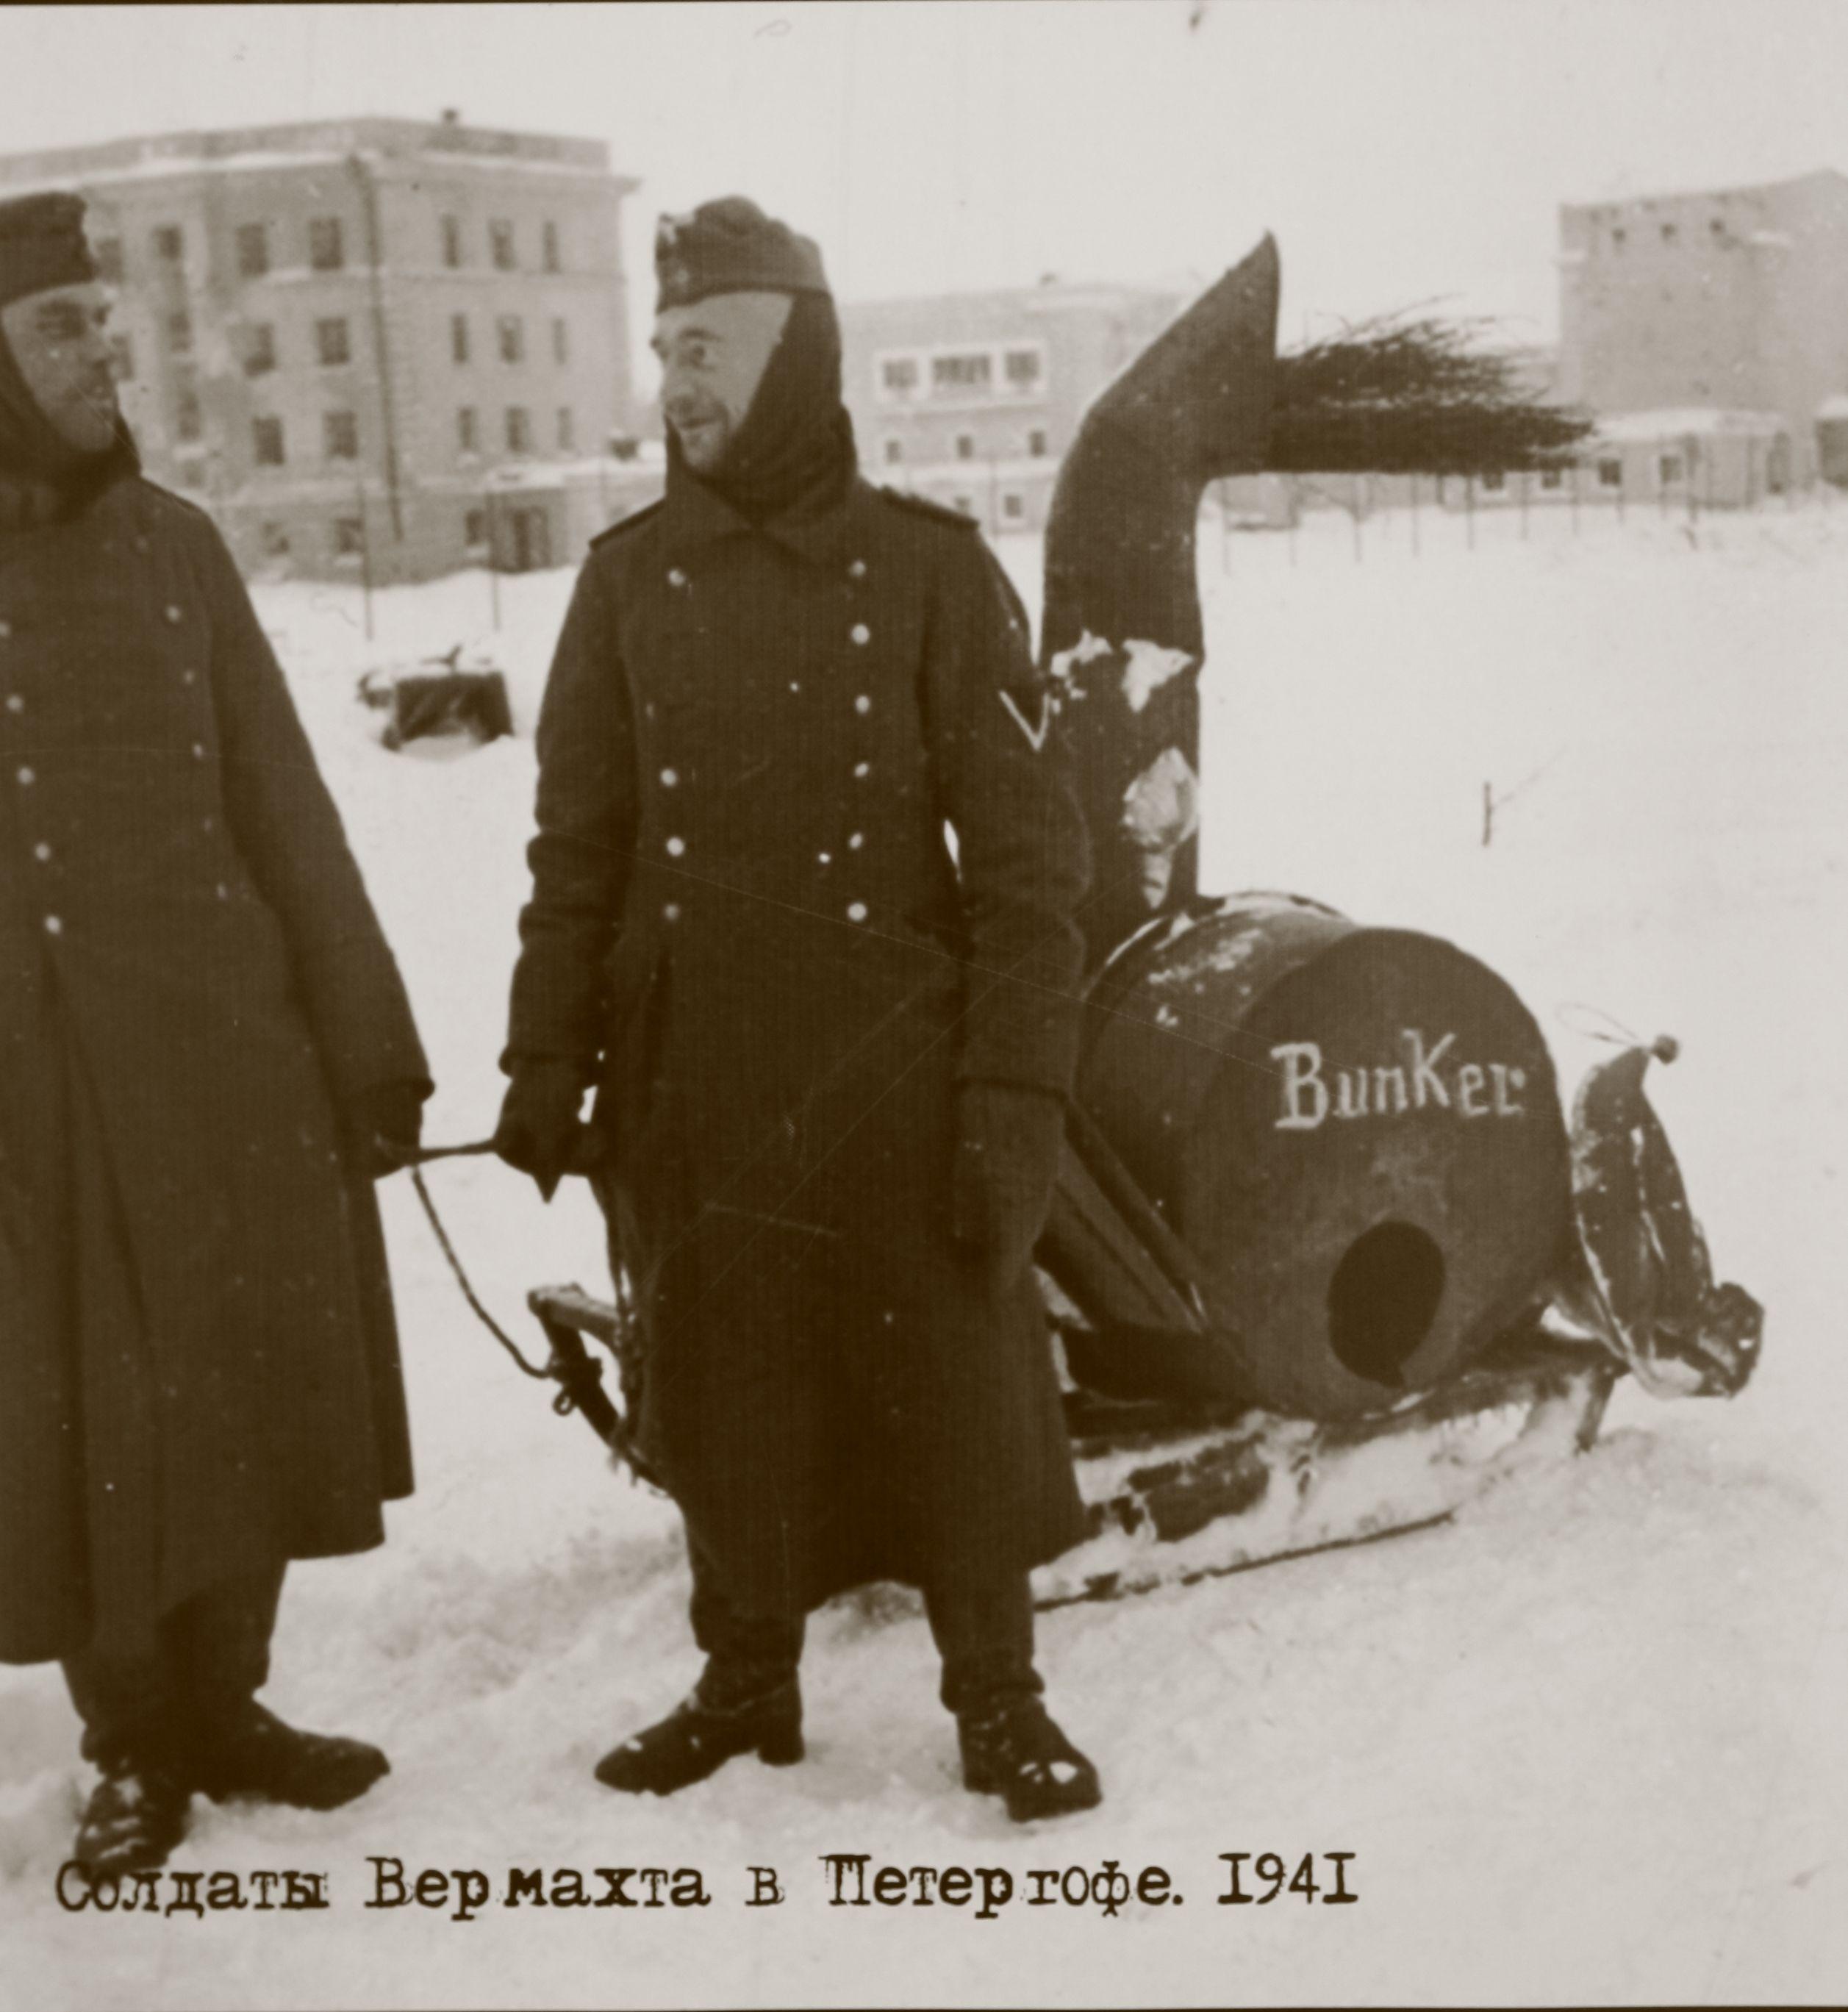 1941. Солдаты Вермахта